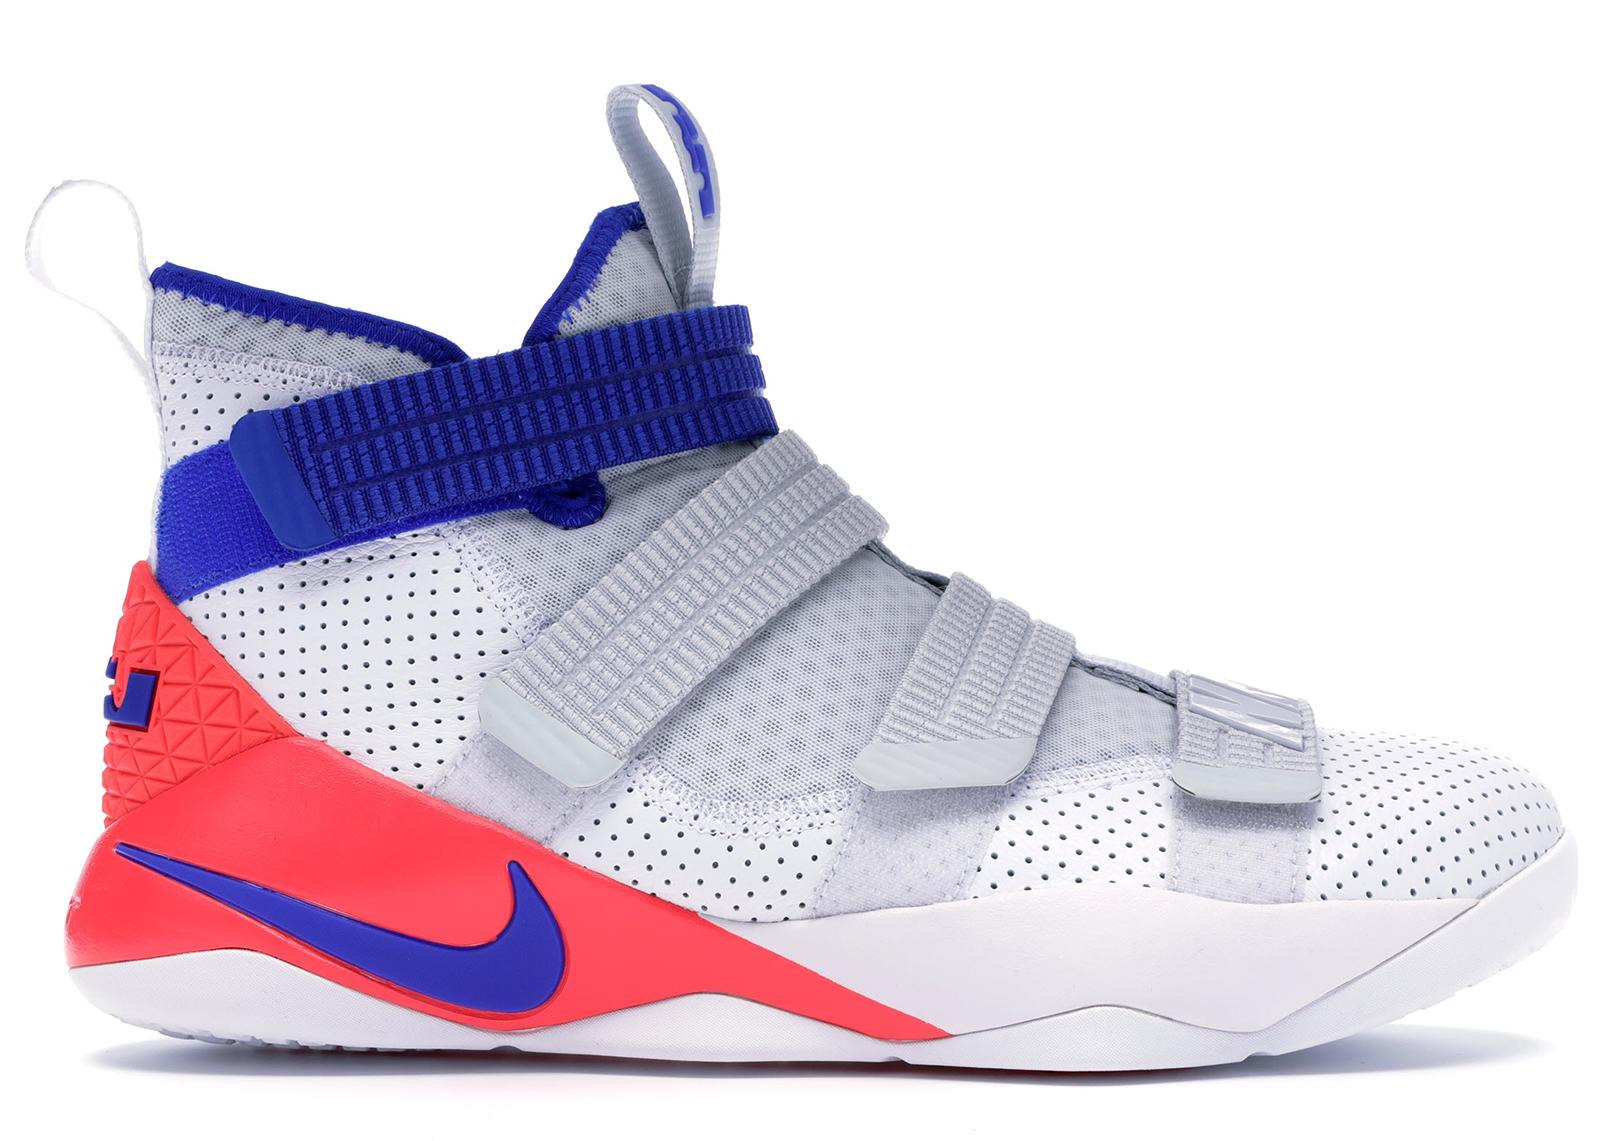 Nike LeBron Zoom Soldier 11 Ultramarine